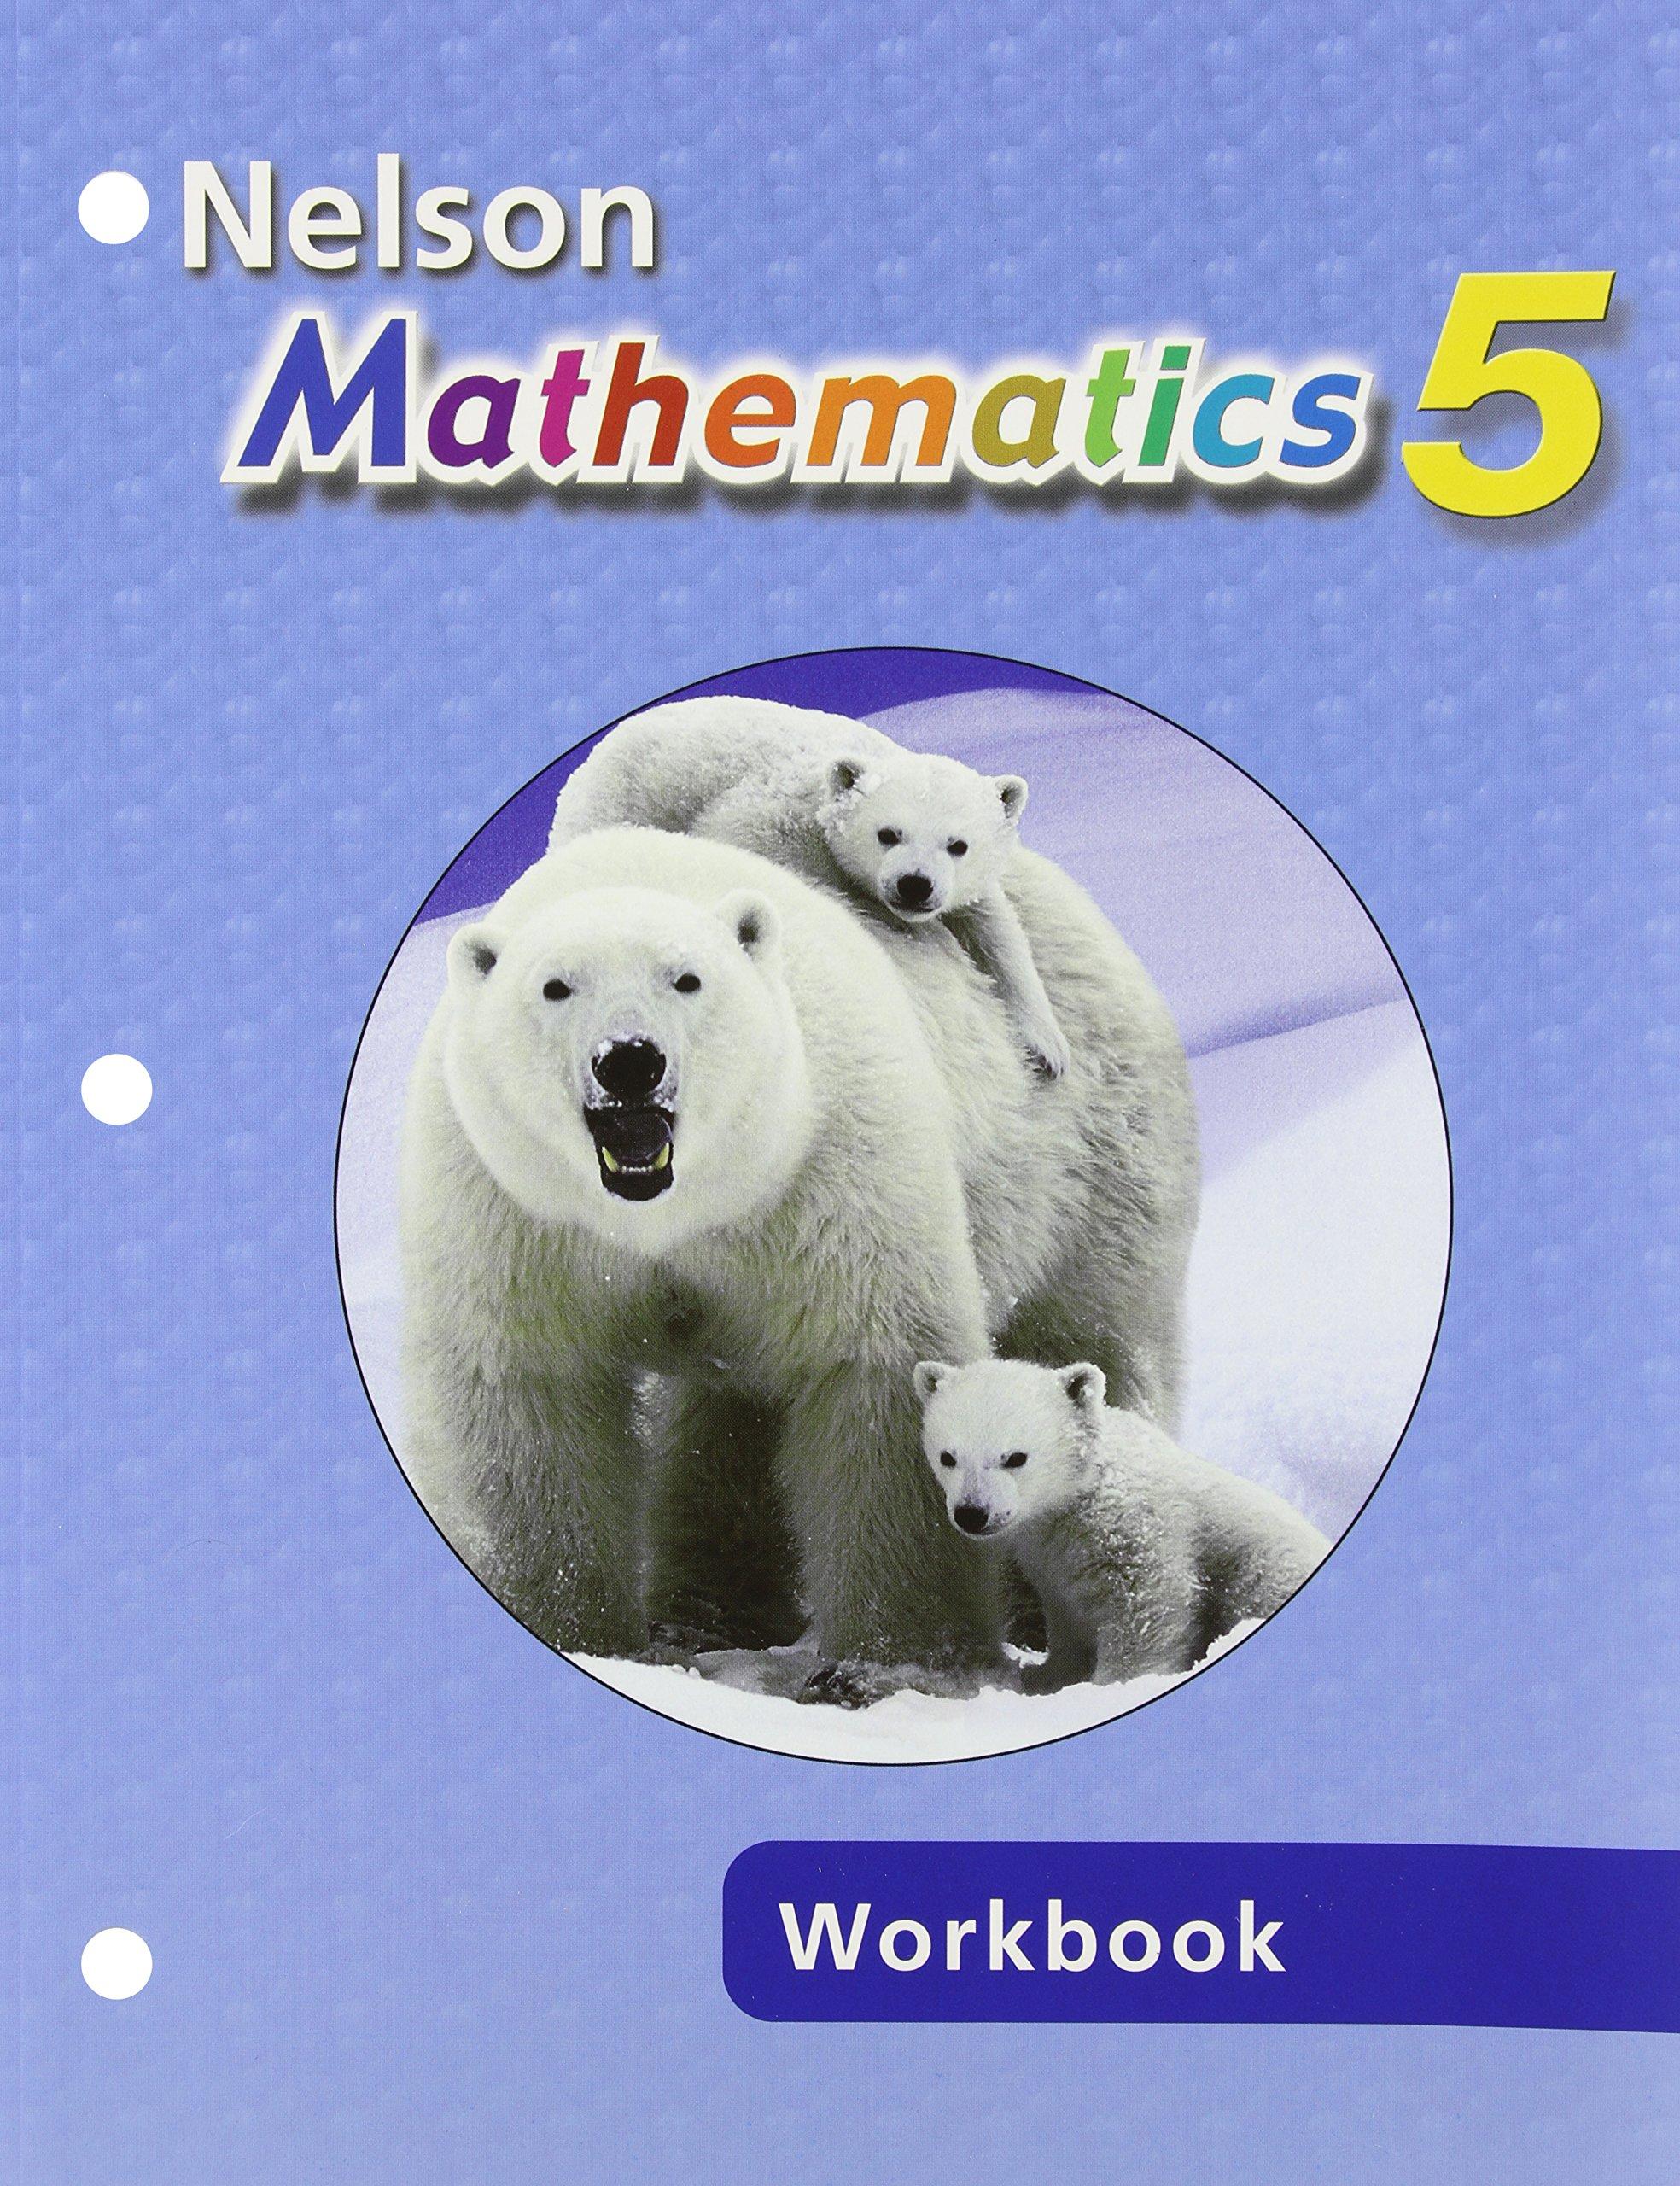 Nelson Grade 8 Math Textbook Online - xsonareastern